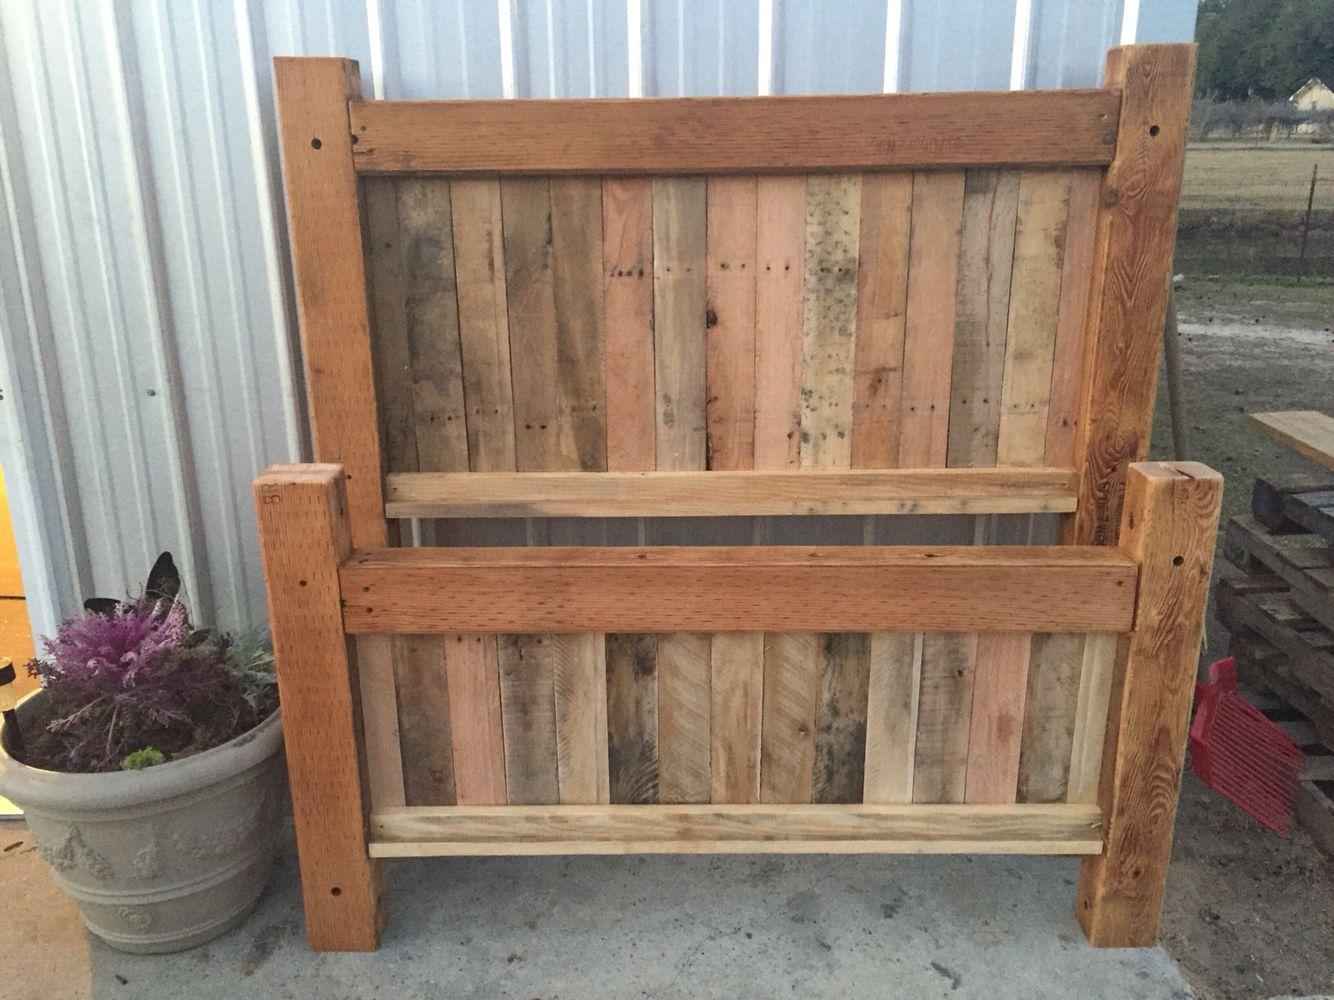 Rustic Handmade Pallet Full Size Headboard And Footboard